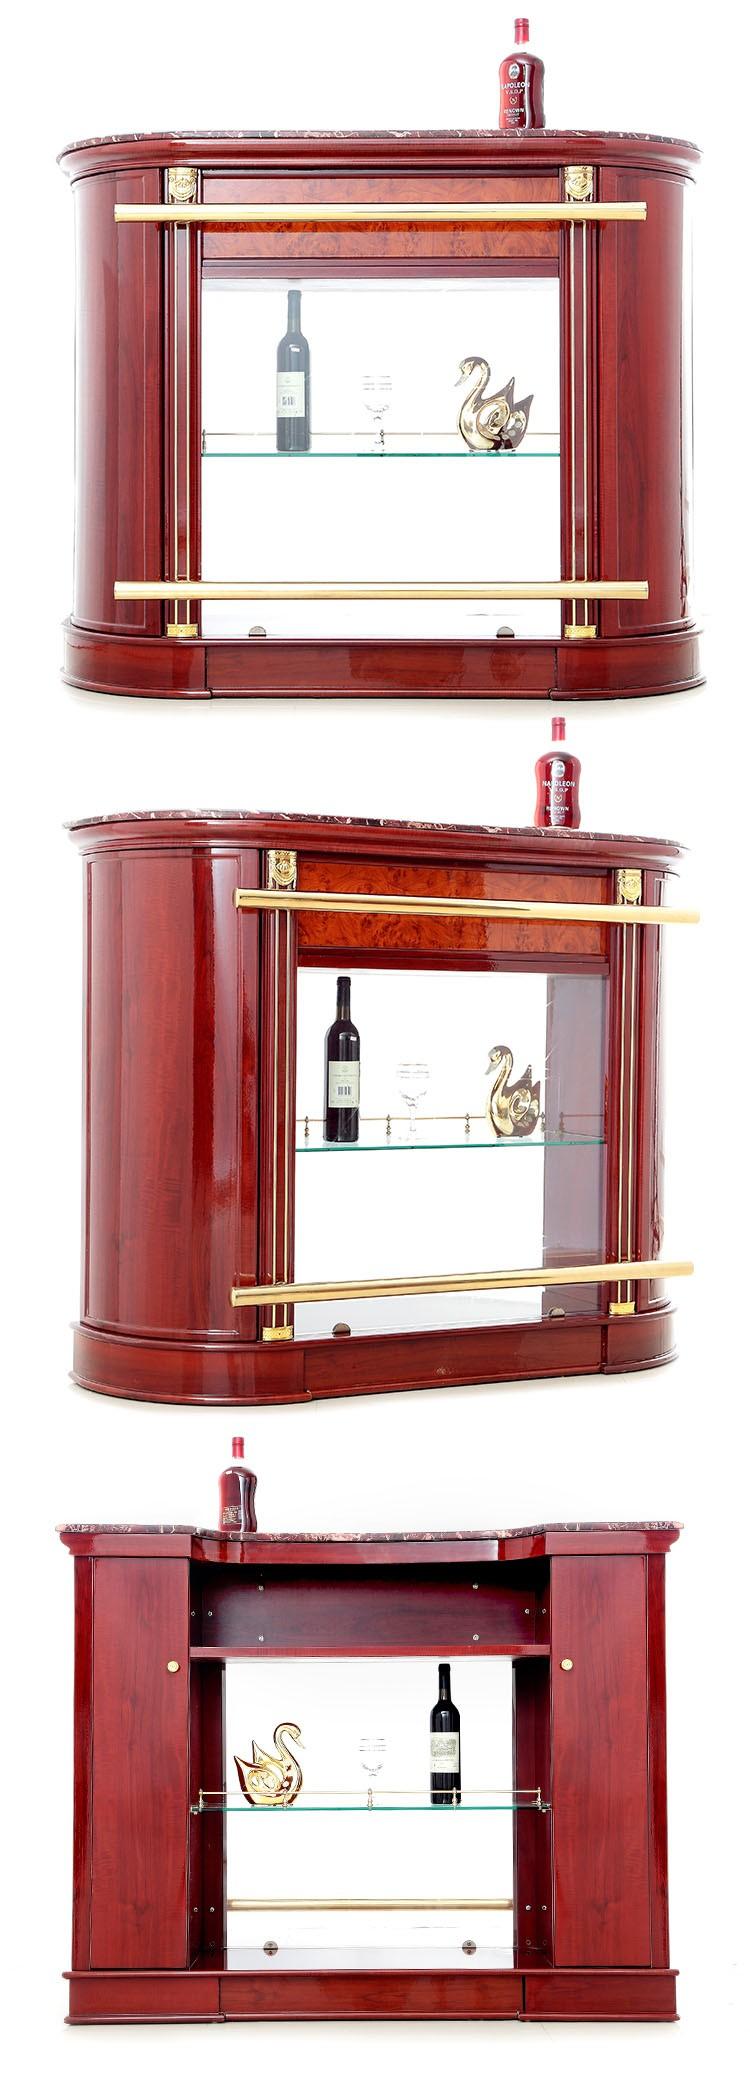 al por mayor barra muebles de madera barata diseo moderno mini home bar